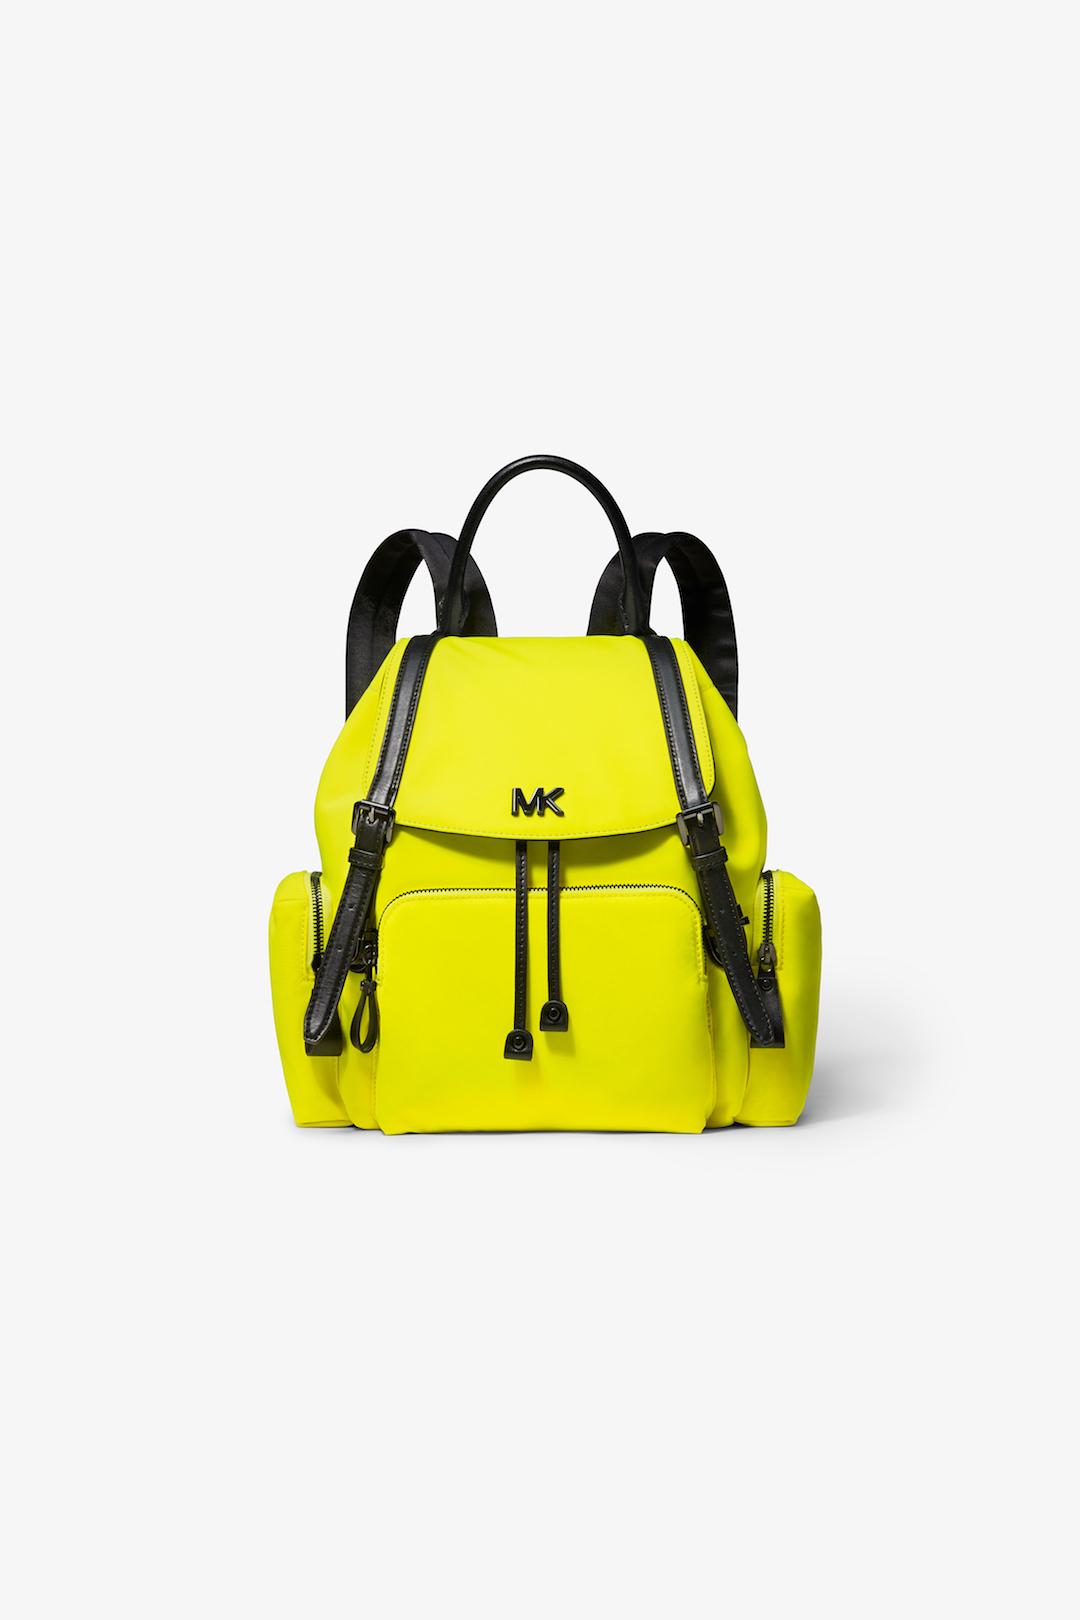 MICHAEL Michael Kors Neon Yellow Beacon Backpack.jpg